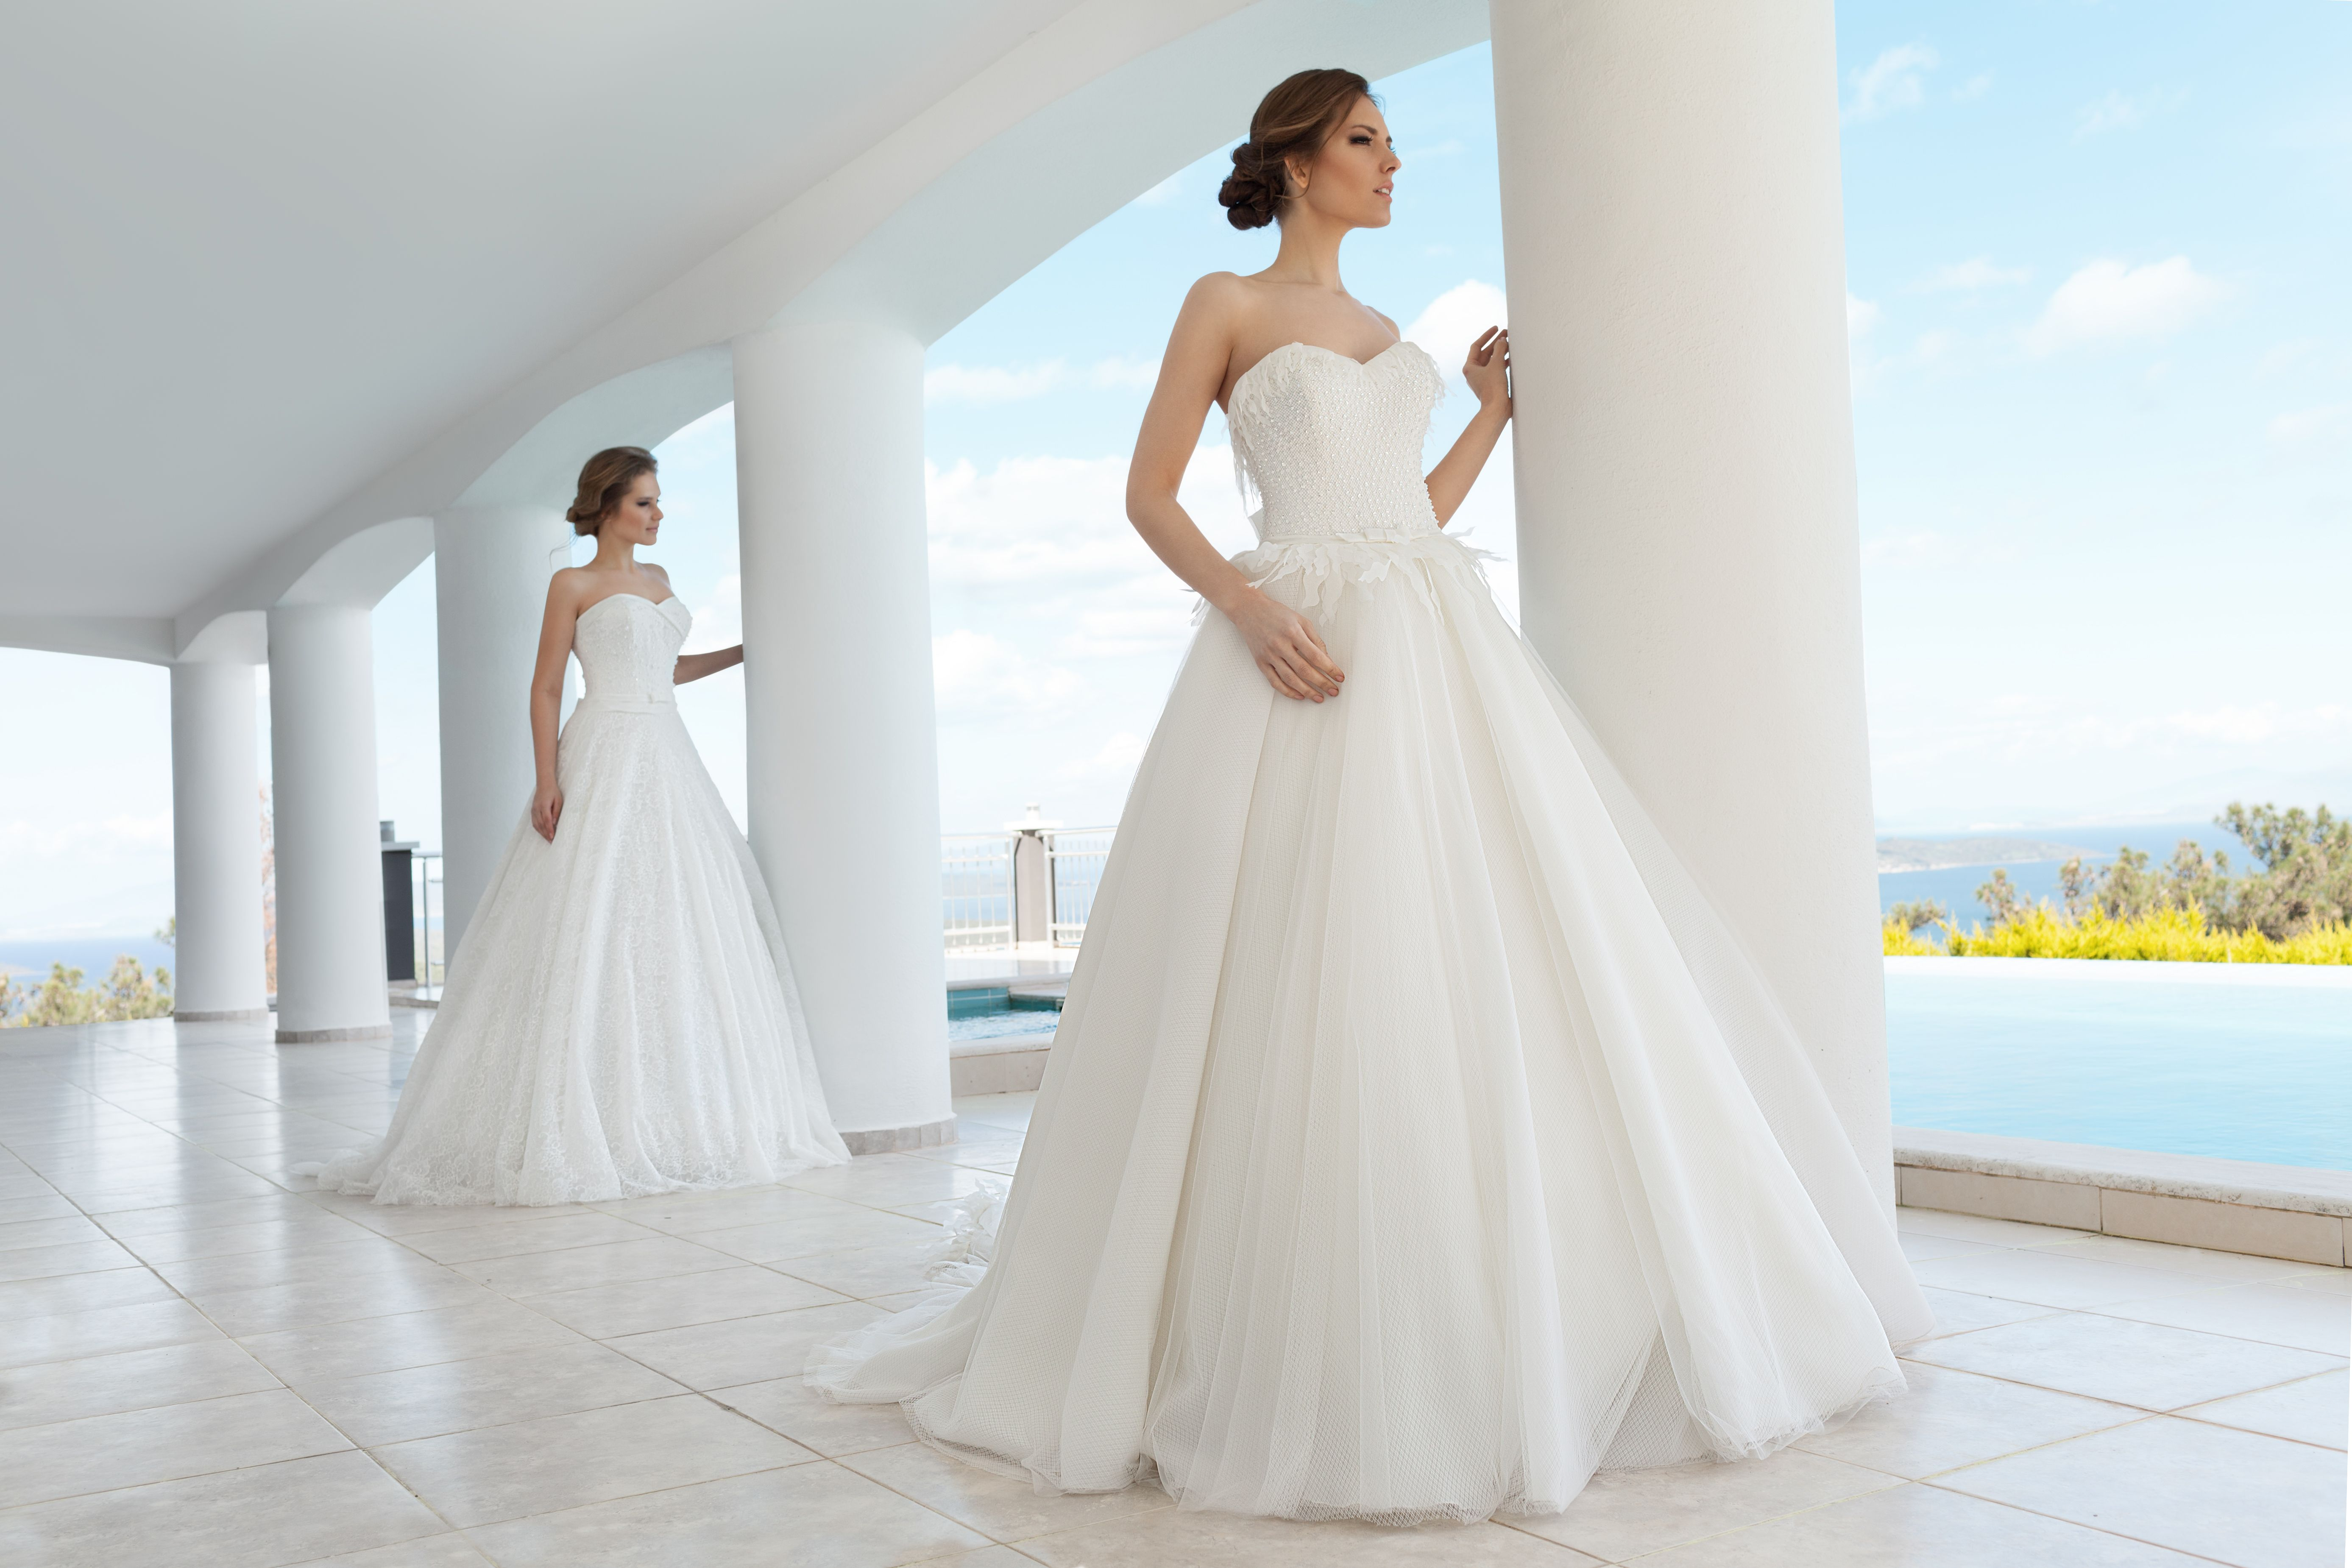 wedding dresses collection, wedding dress designs, nova bella bridal ...